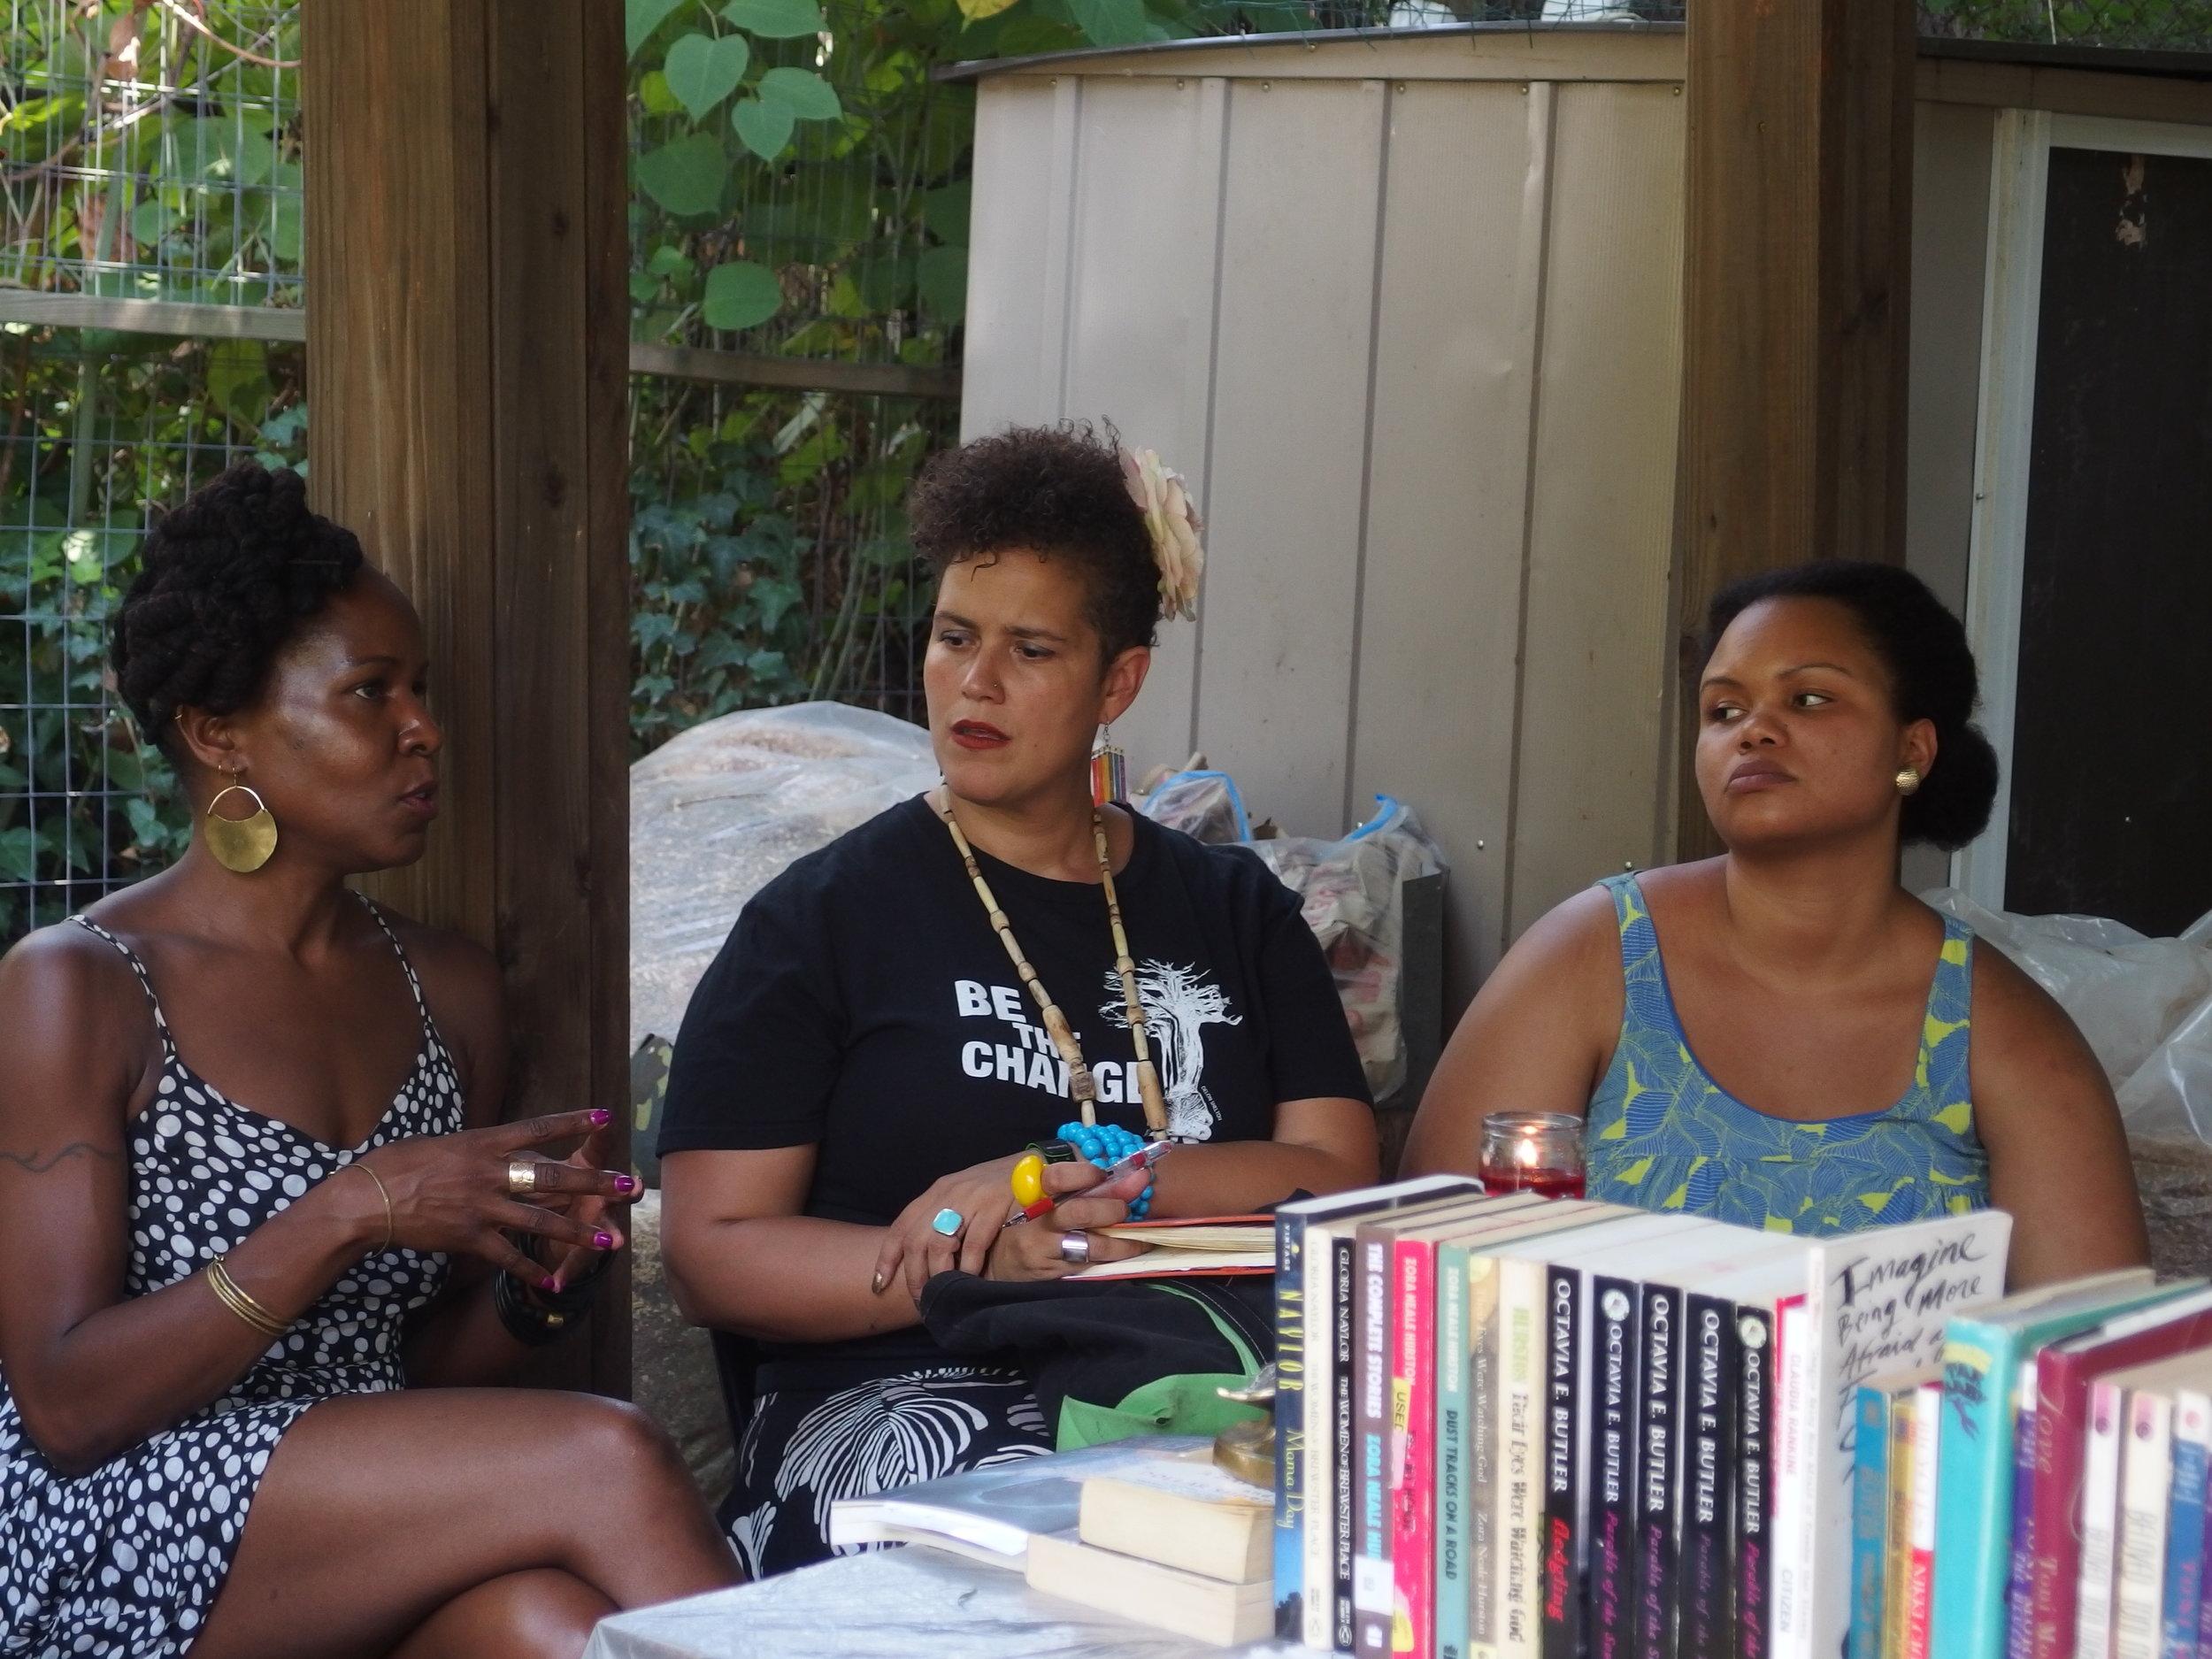 little-free-black-womens-library_20763179688_o.jpg